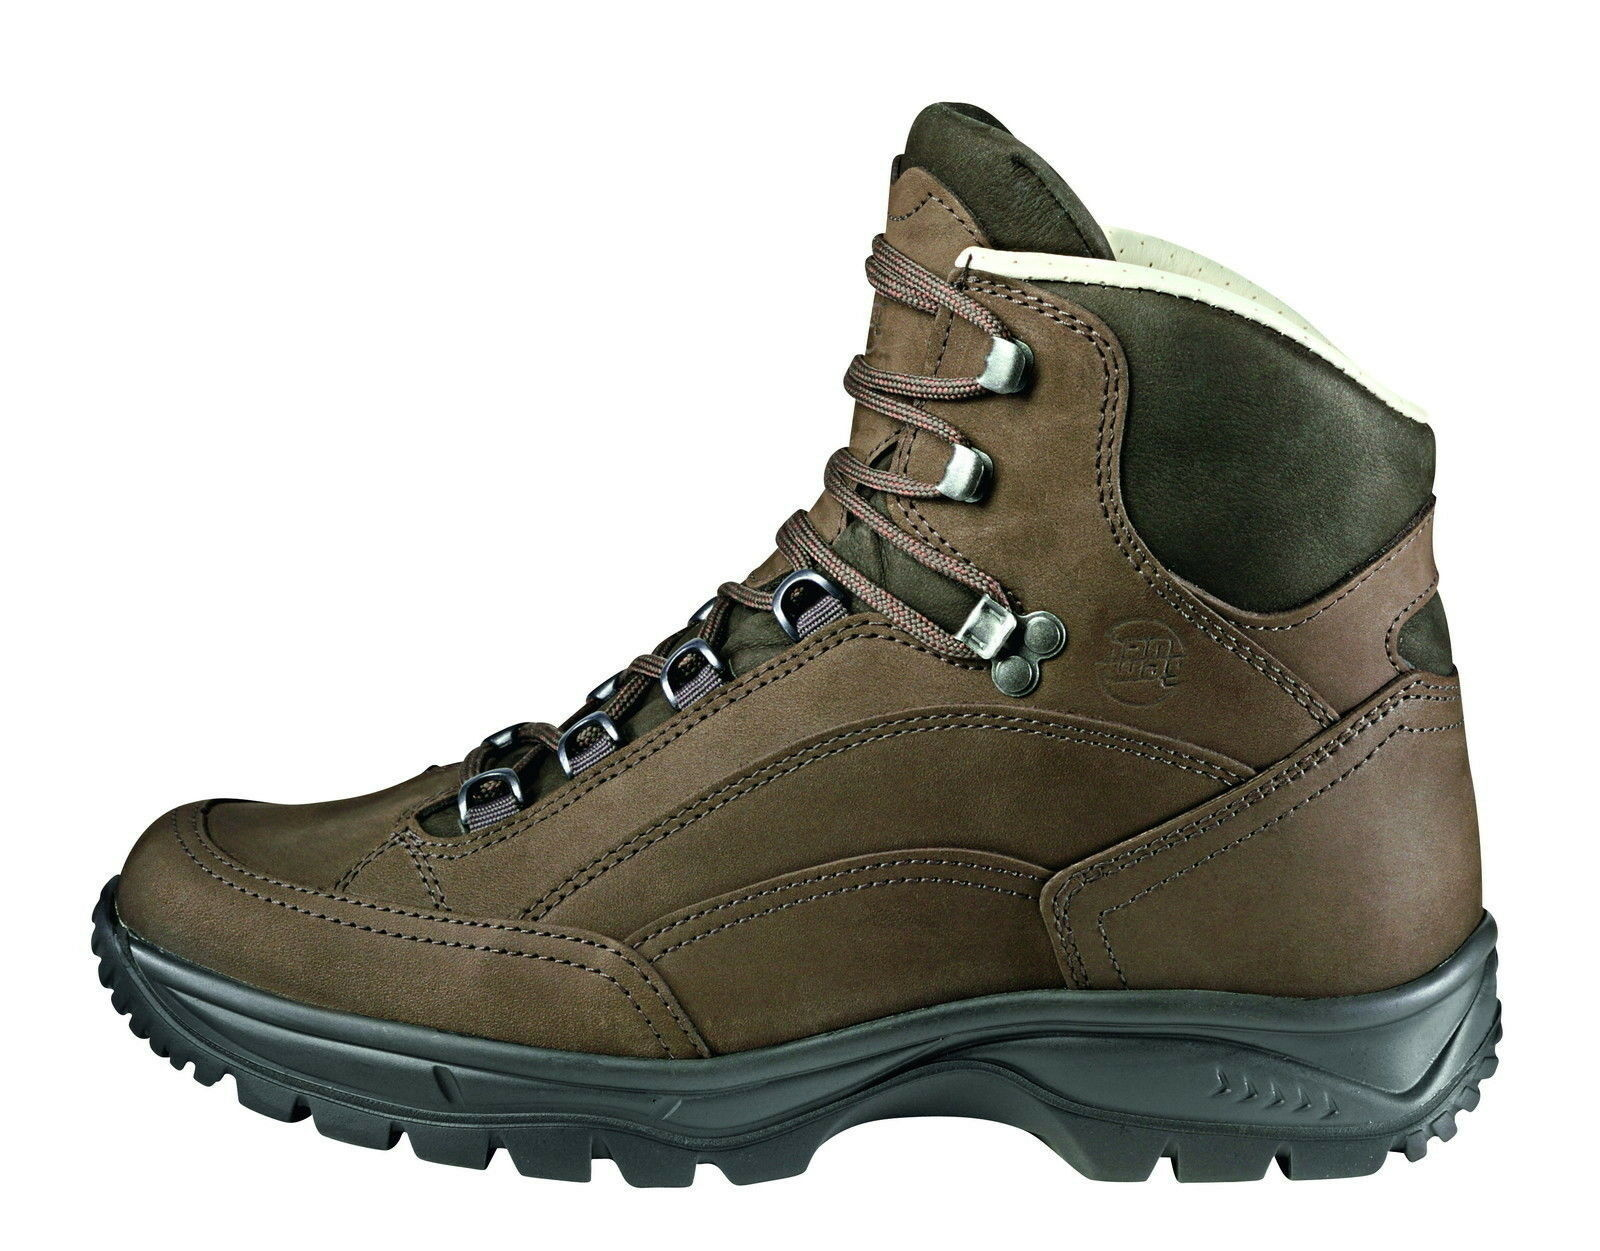 Hanwag Mountain shoes Canyon Men II, Leather Earth Size 8